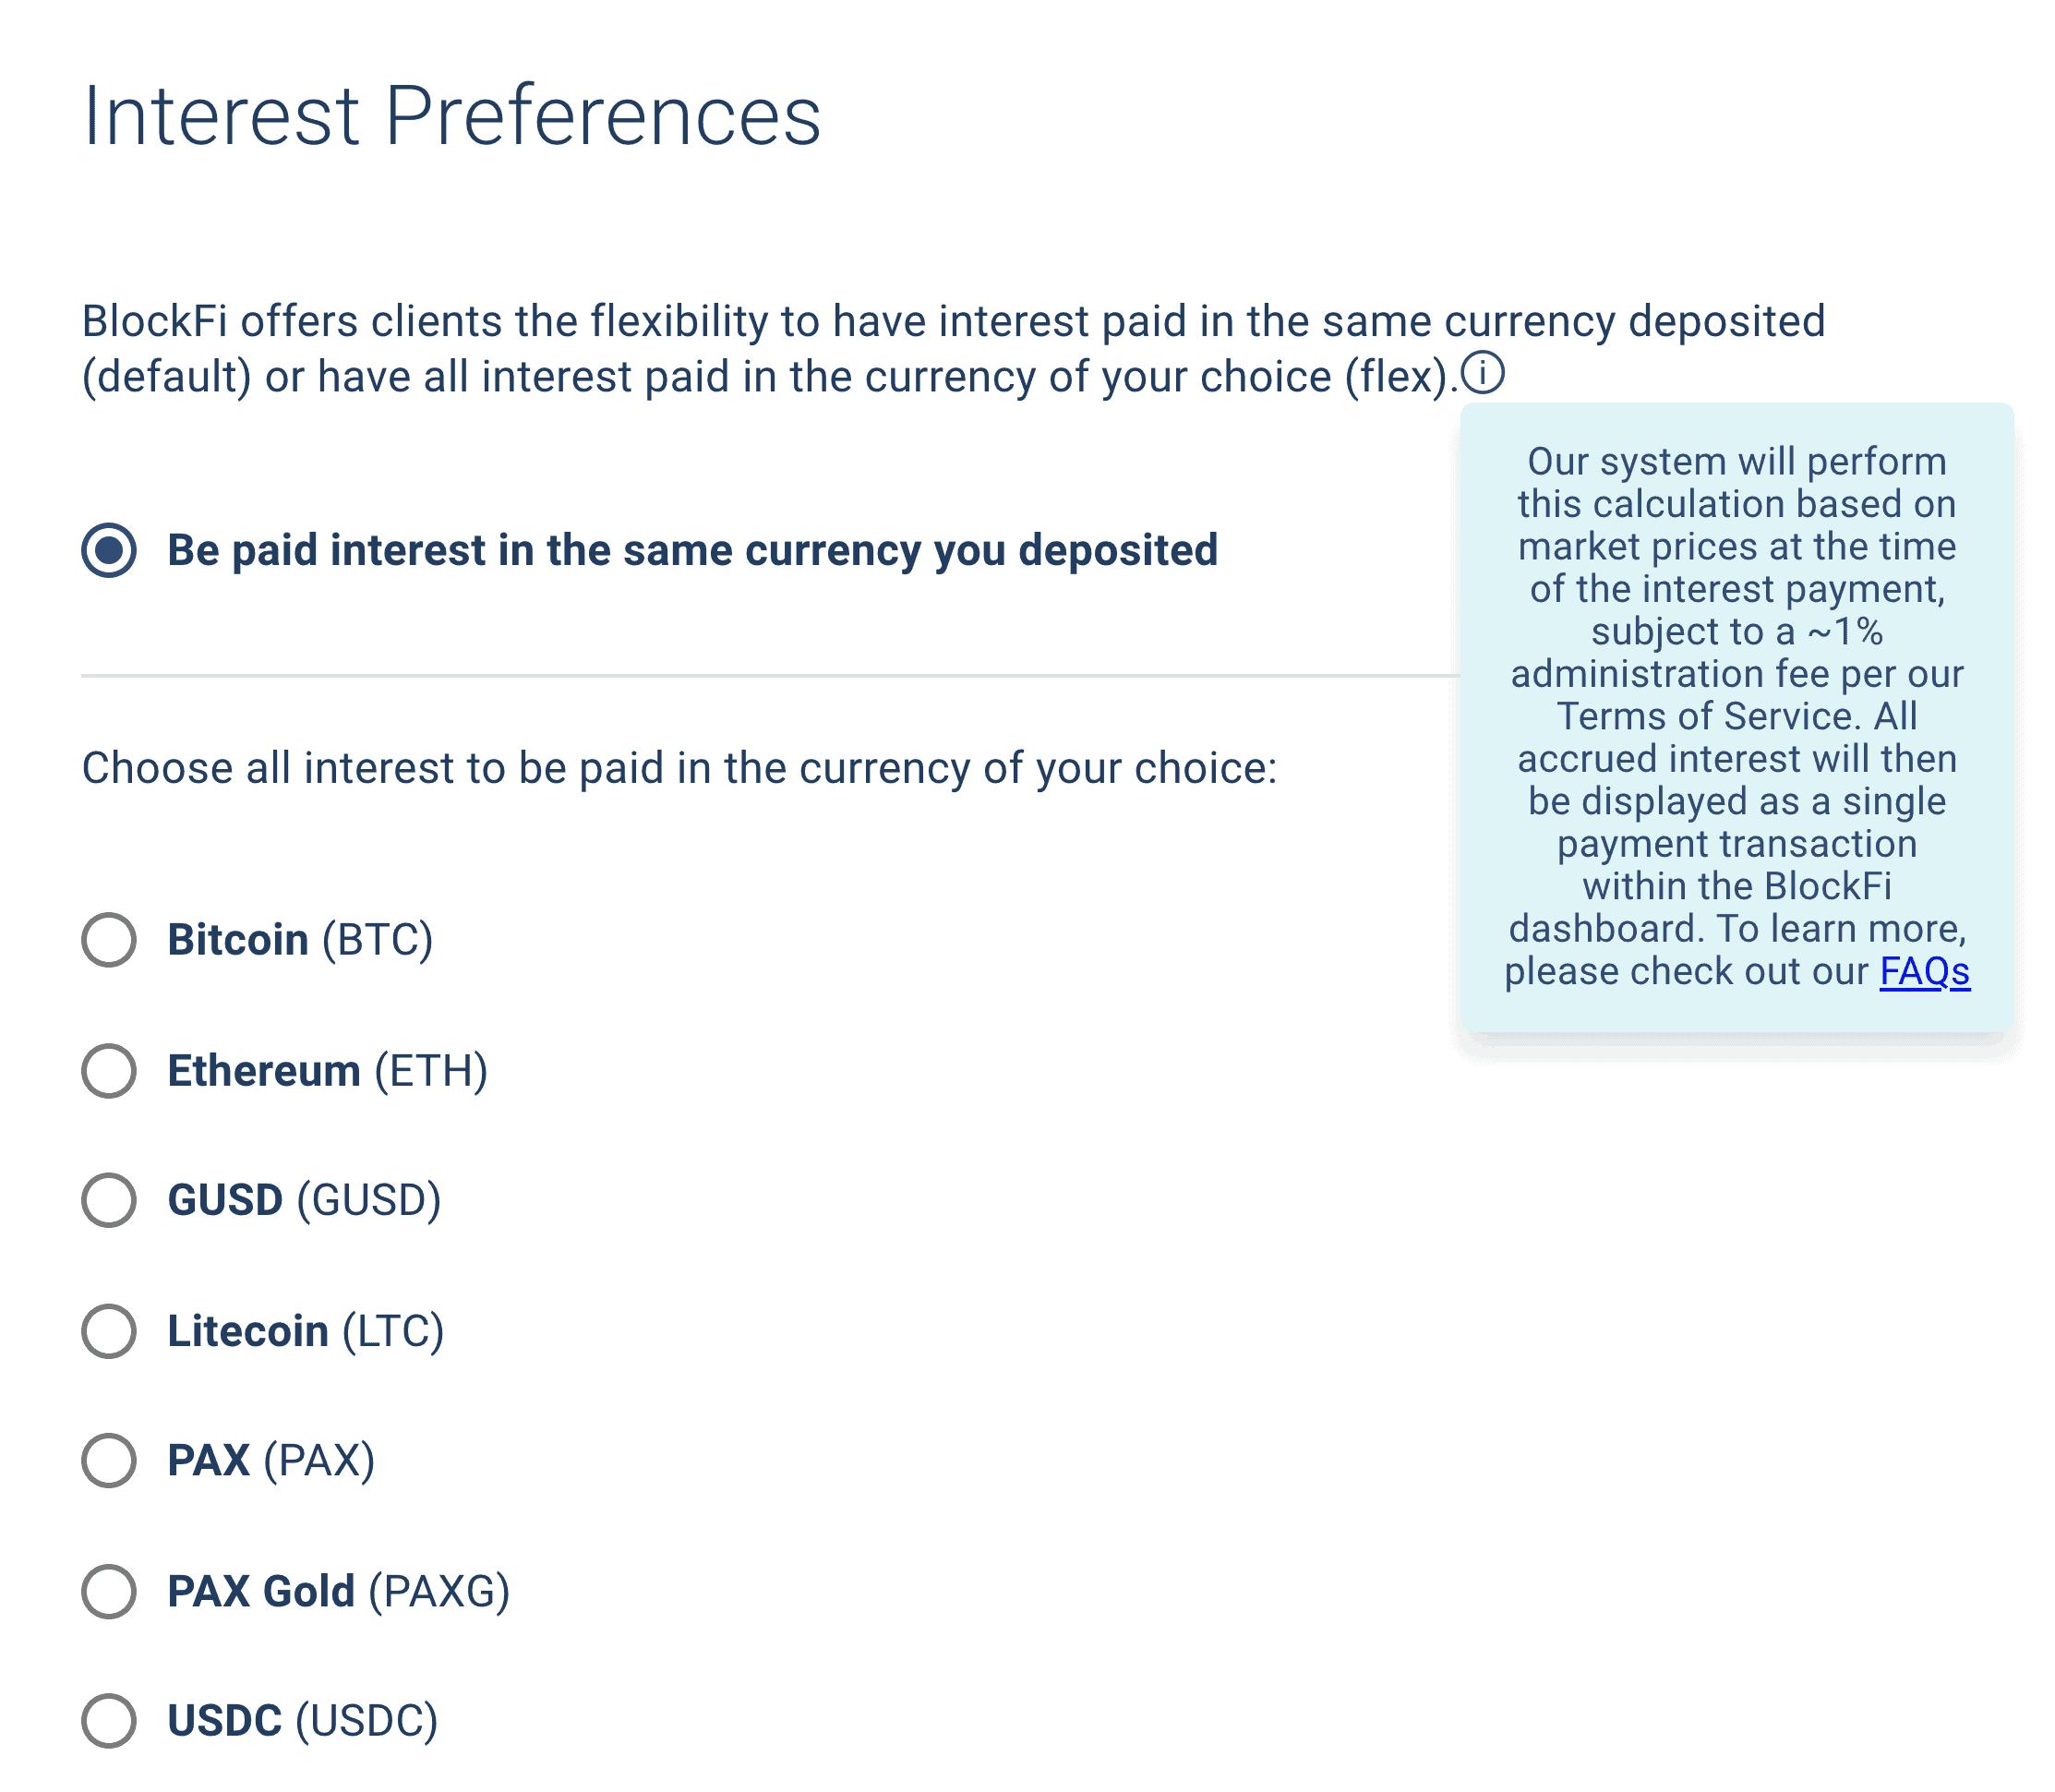 BlockFi interest preferences